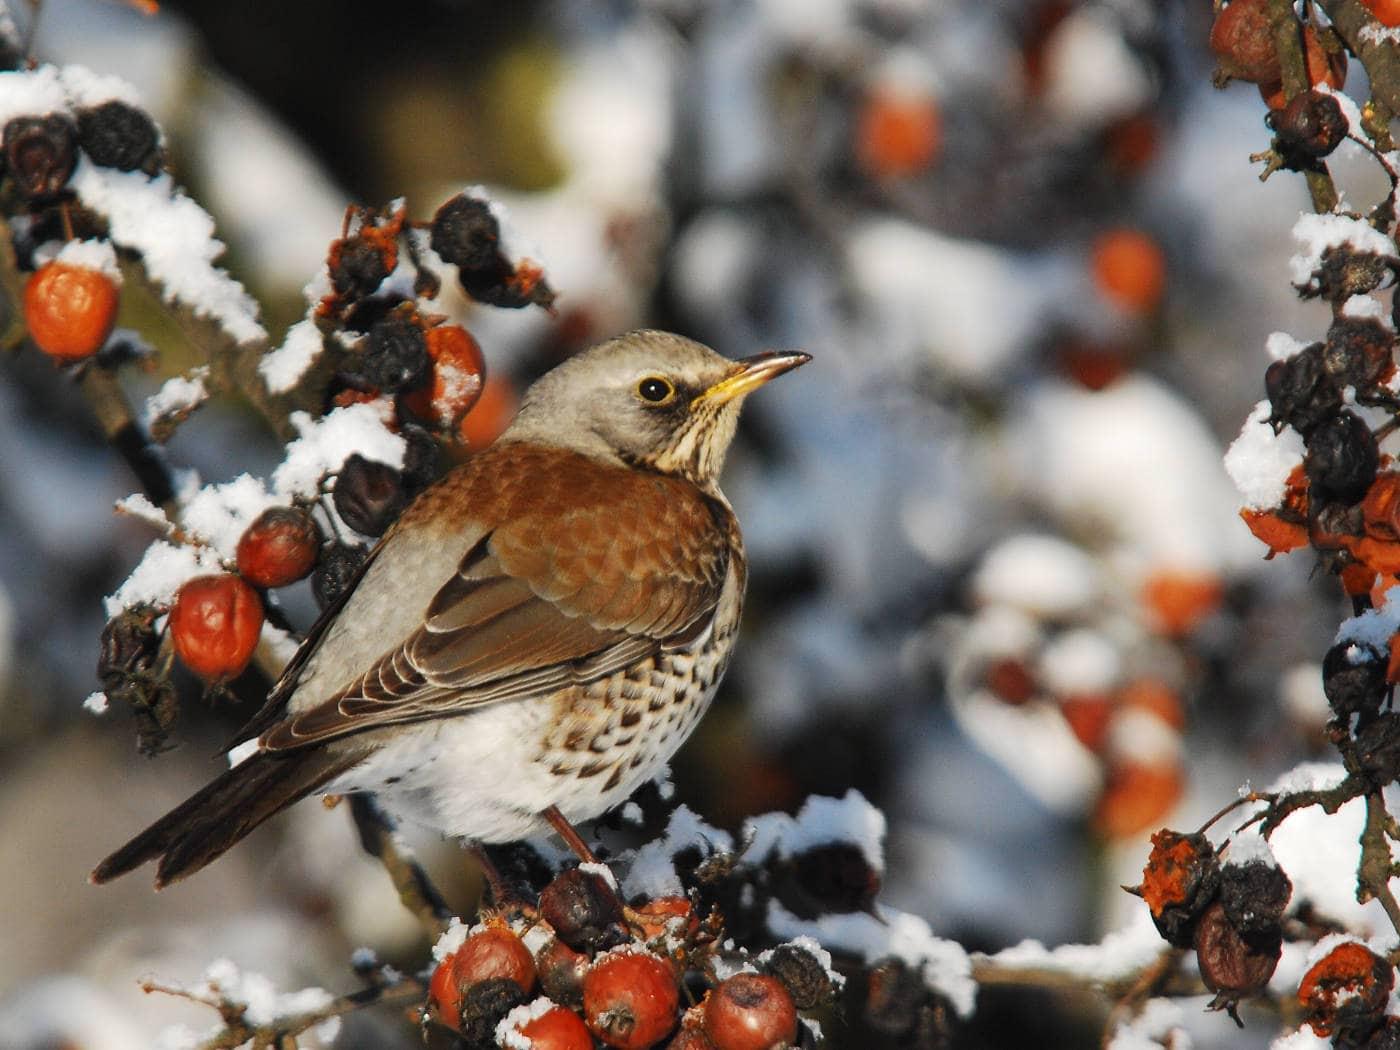 Natur entdecken mit dem Freilandlabor: Wacholderdrossel // HIMBEER